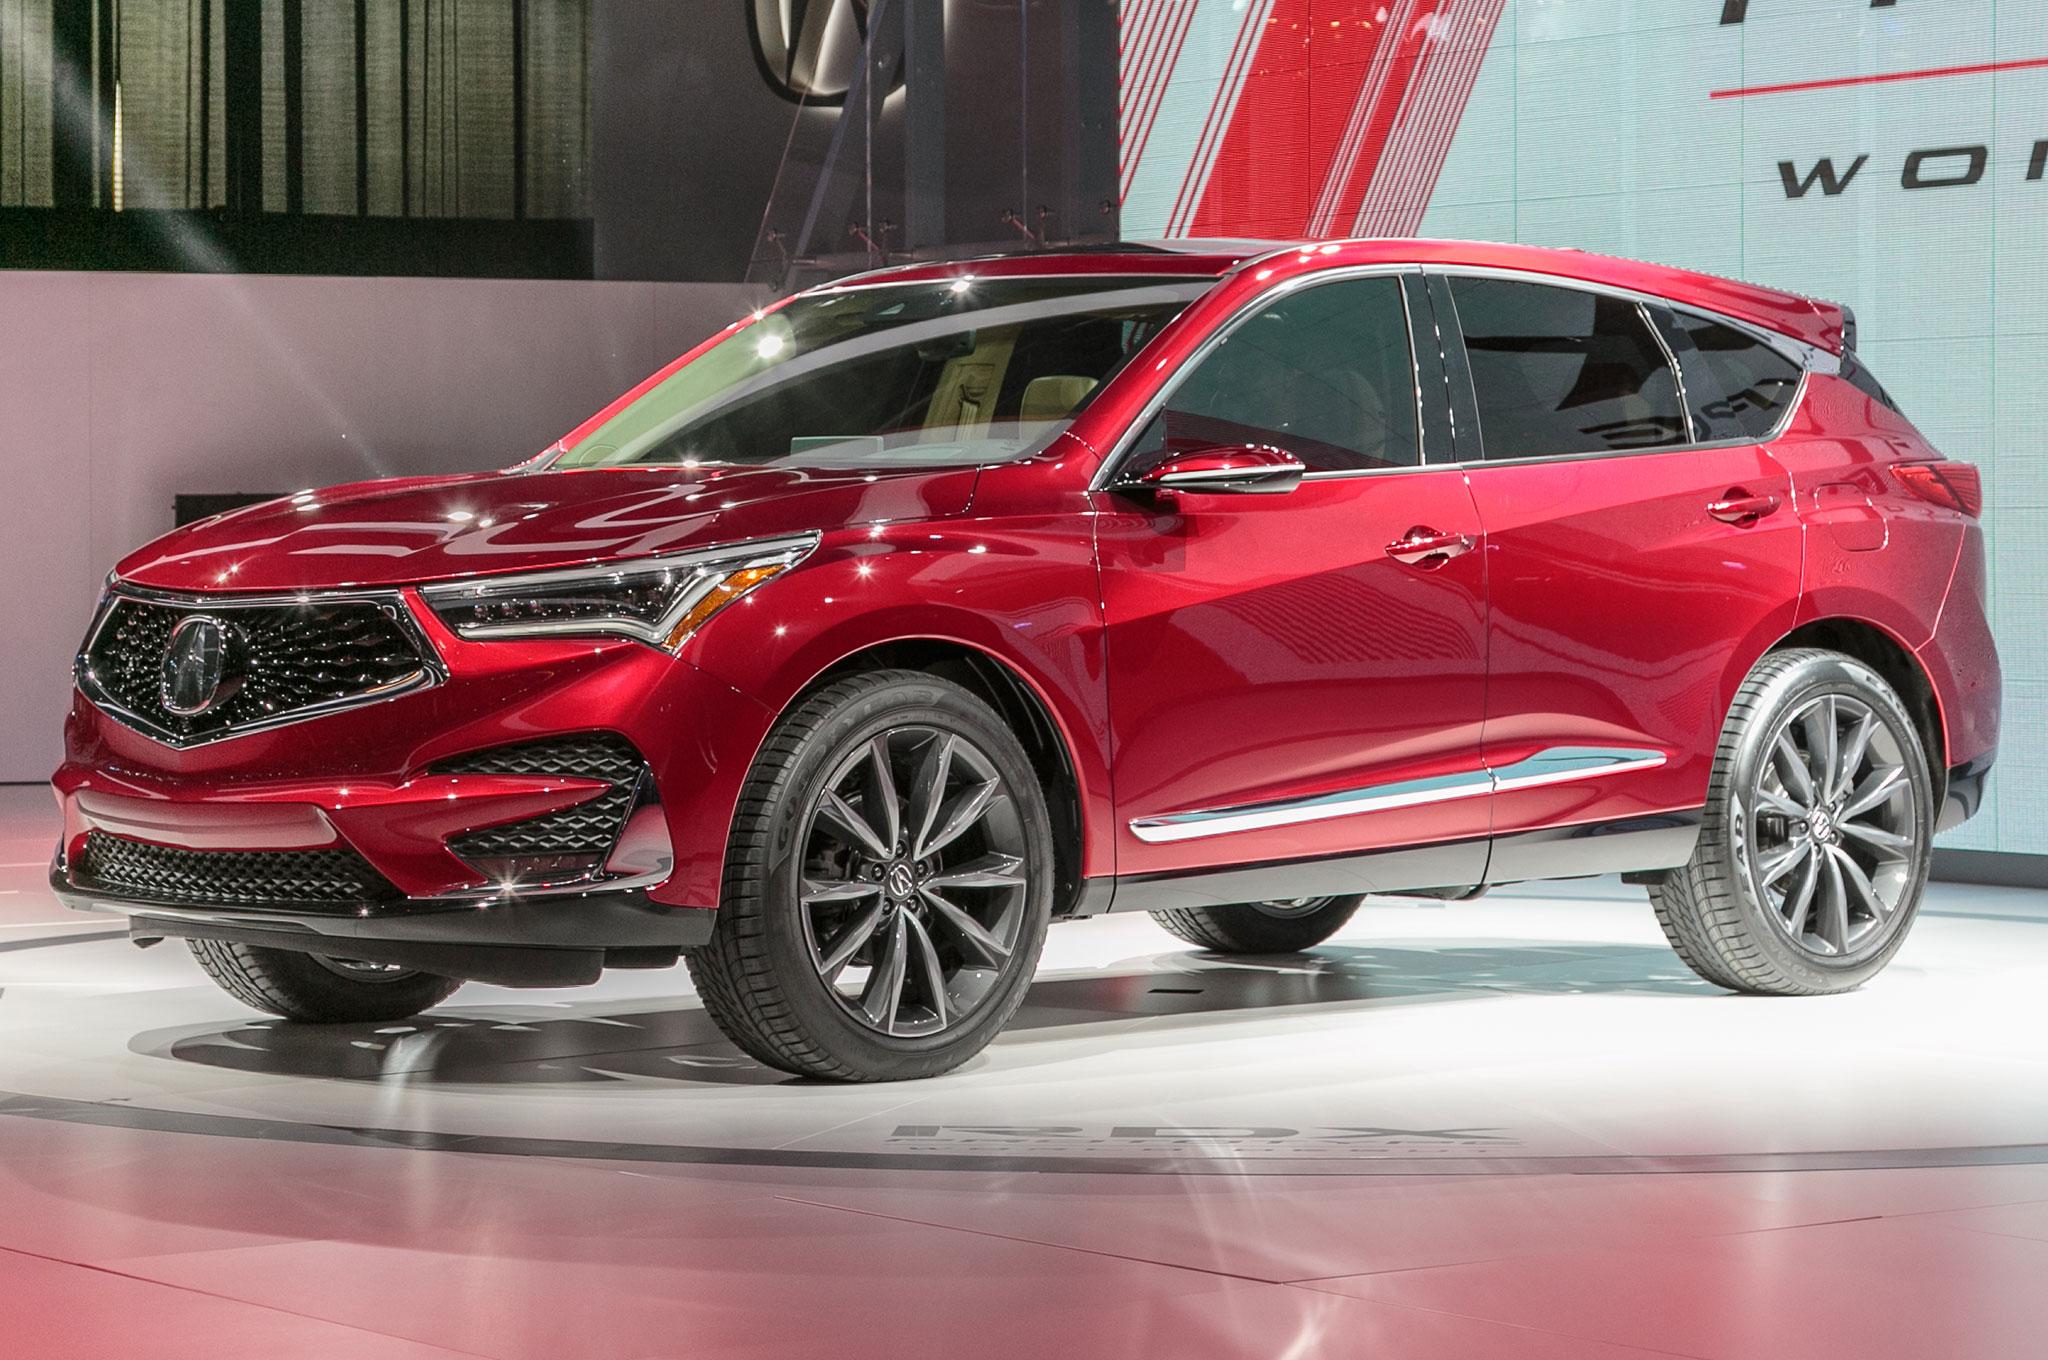 2019 Acura RDX Headed to New York Auto Show | Automobile ...